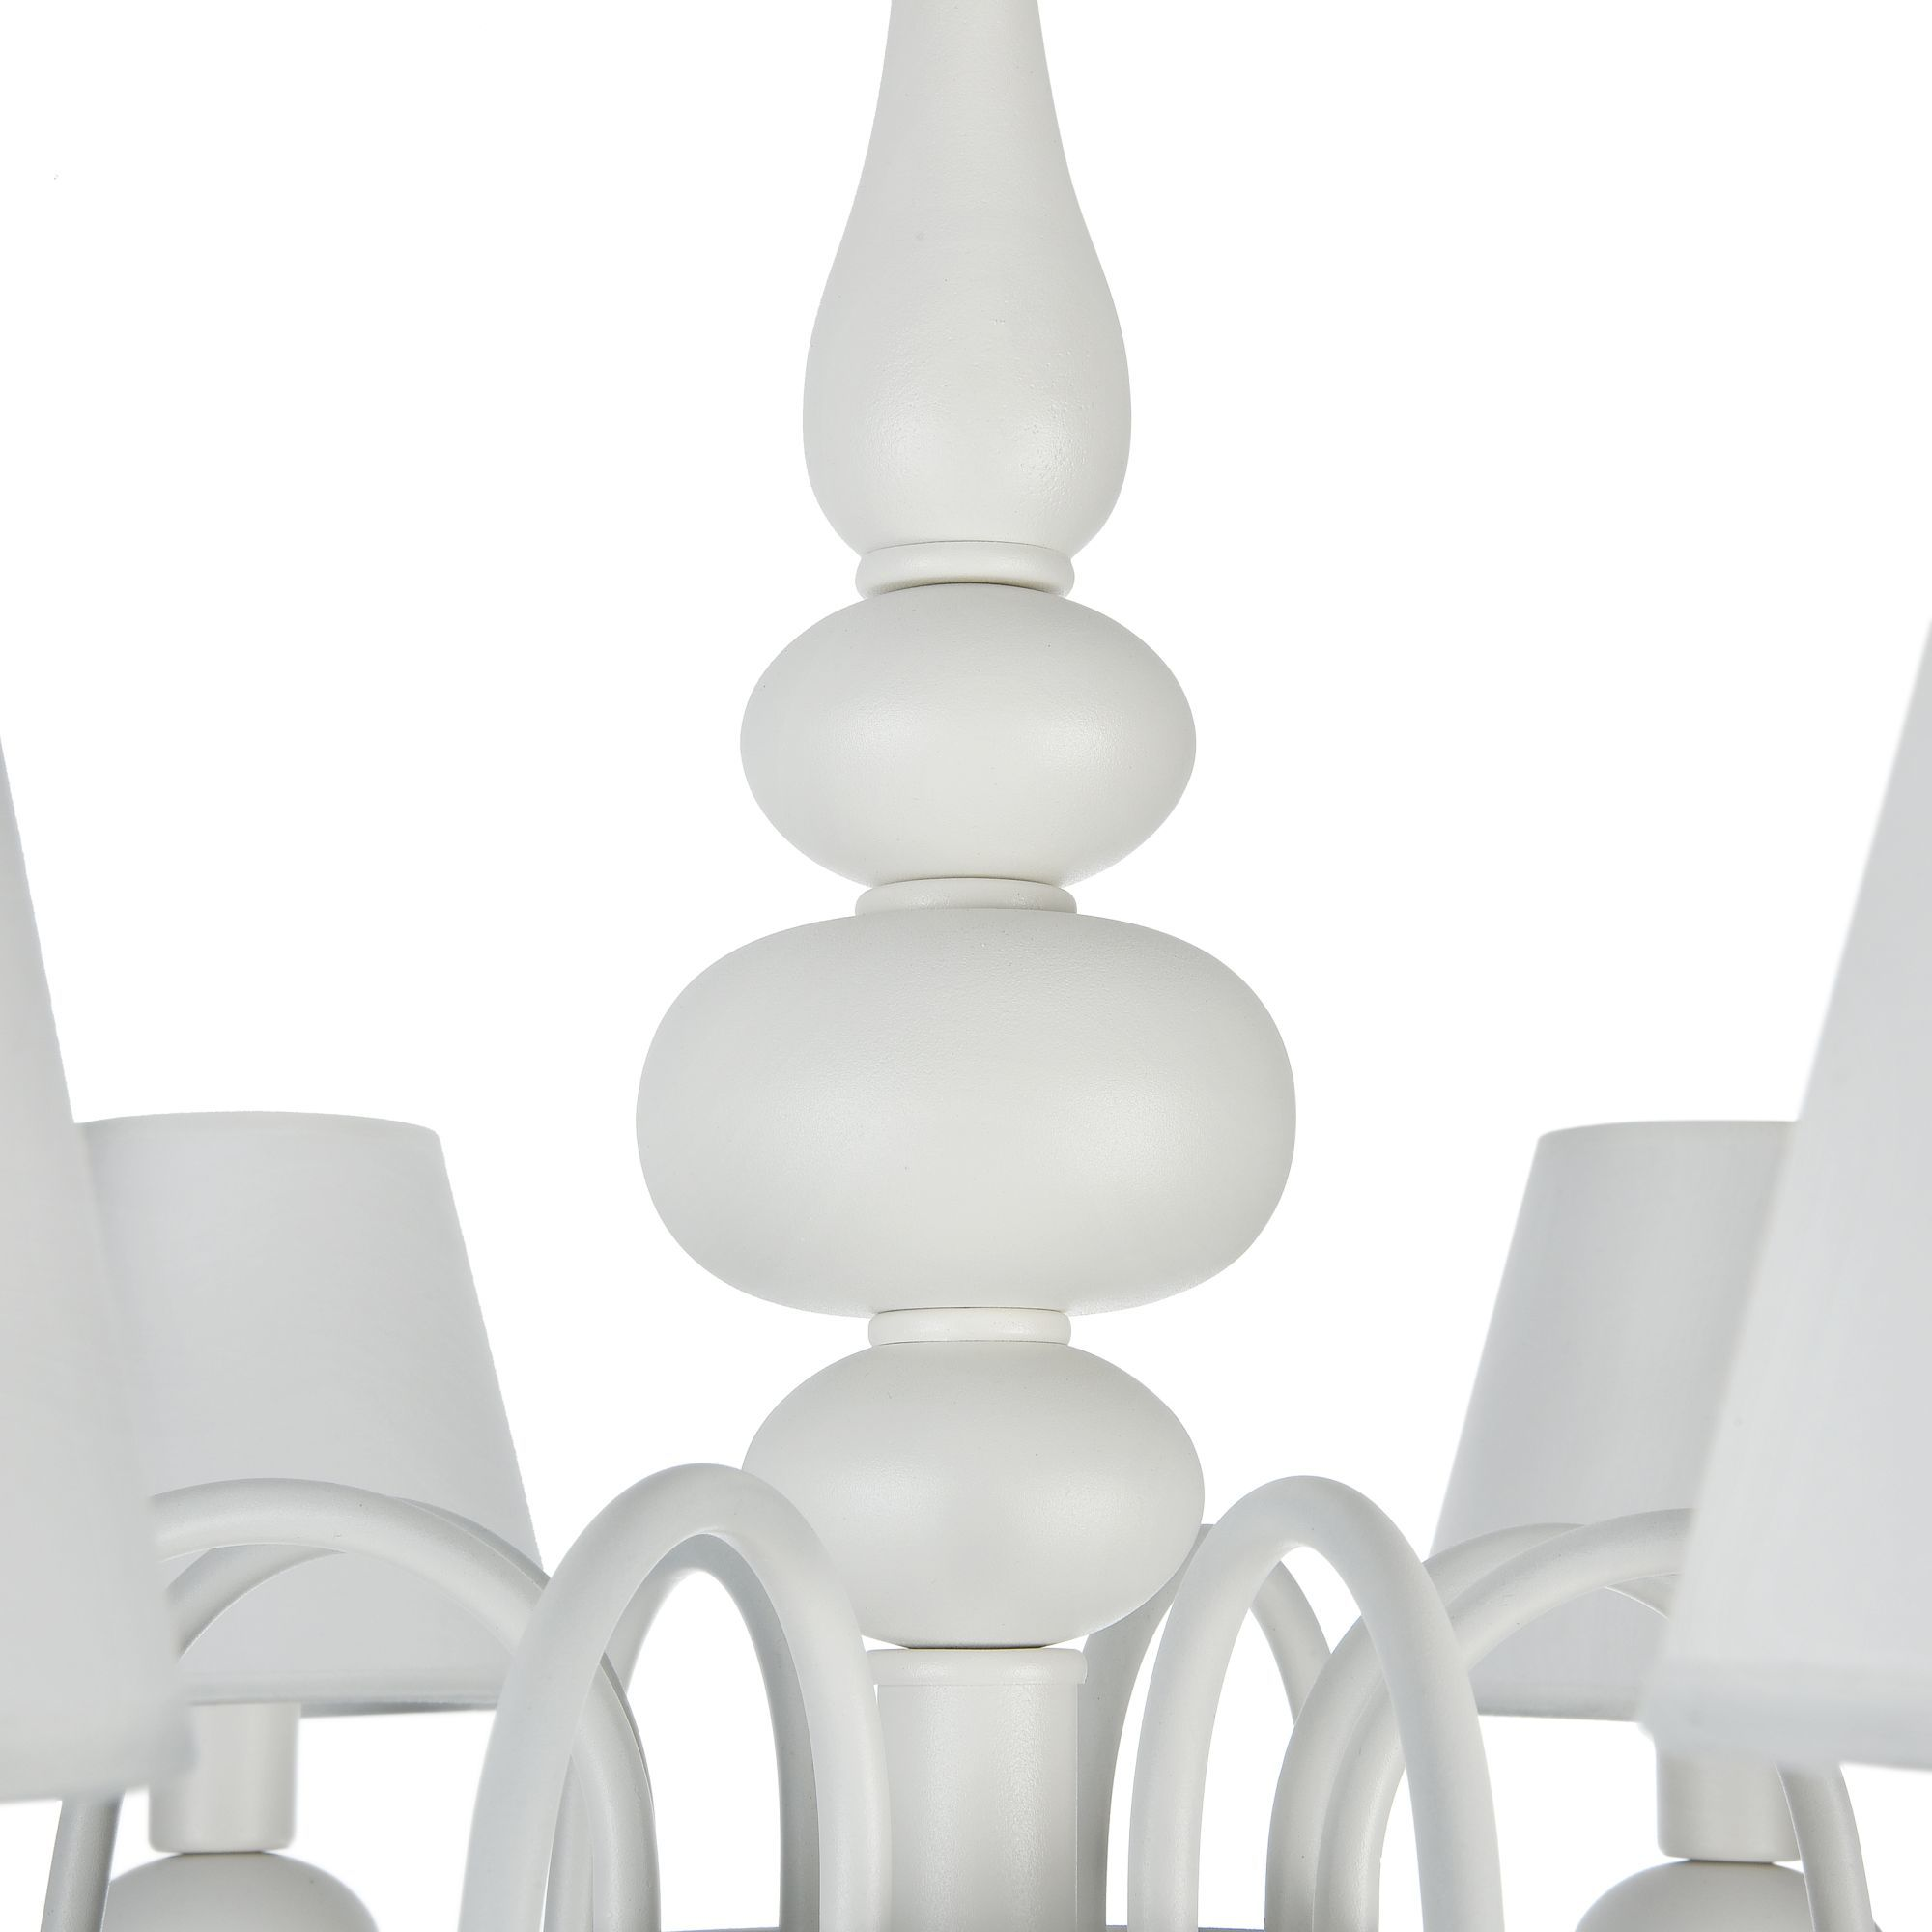 Подвесная люстра Freya Eliza FR5756-PL-08-W, 8xE14x40W, белый, металл, текстиль, стекло - фото 8